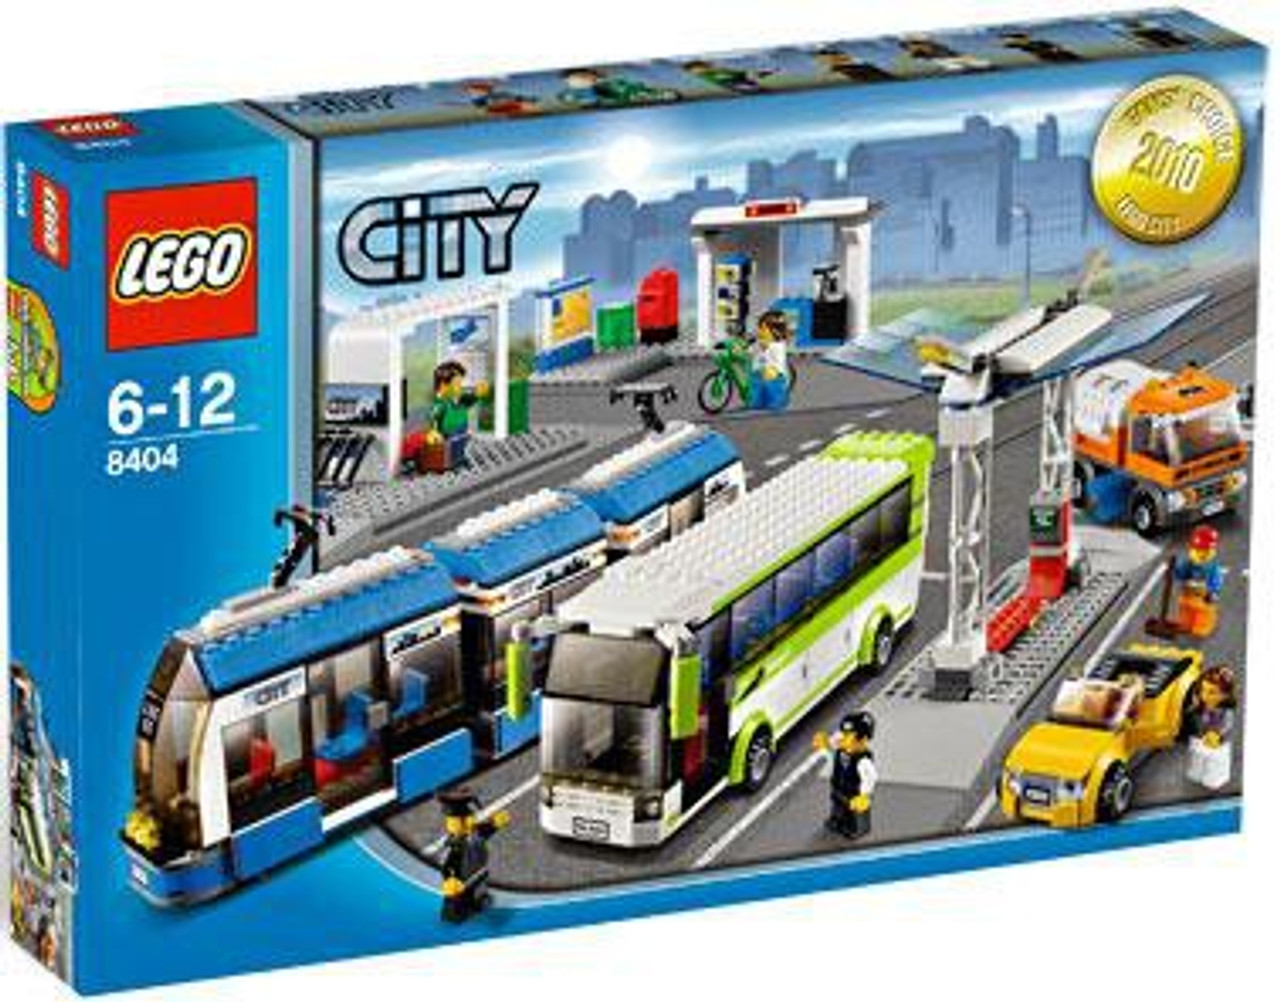 LEGO City Public Transport Station Set #8404